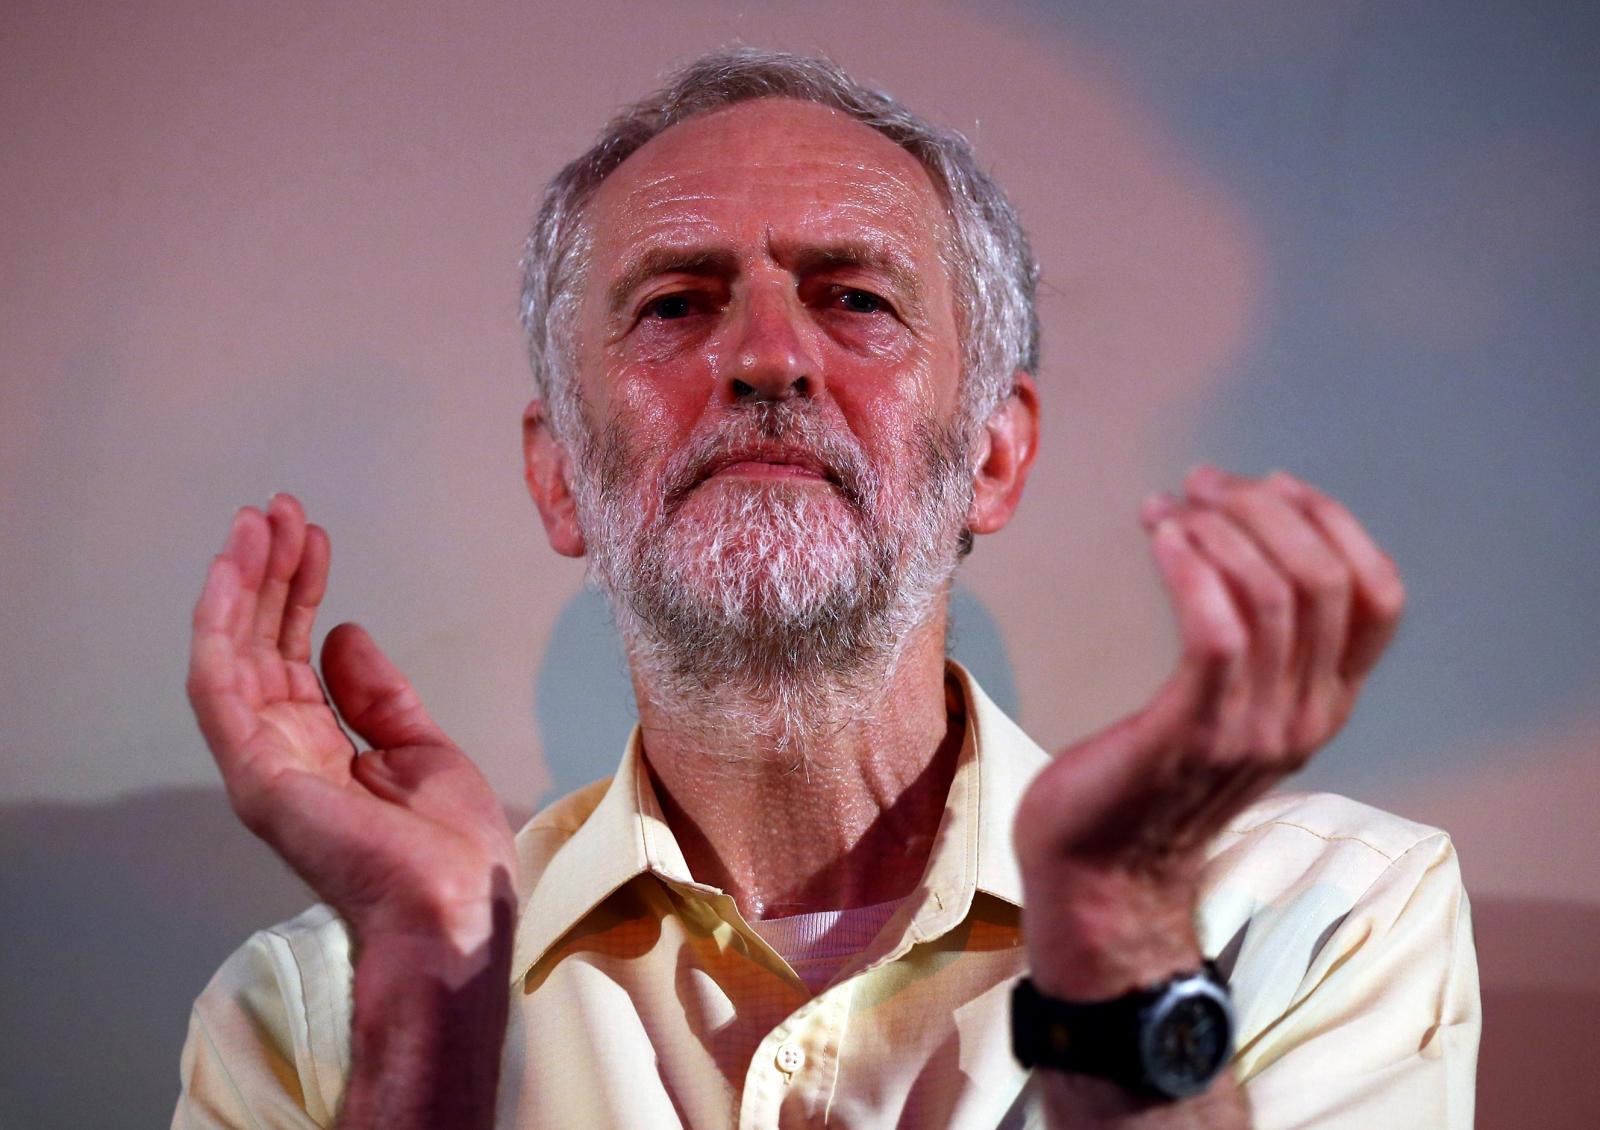 Jeremy Corbyn clapping